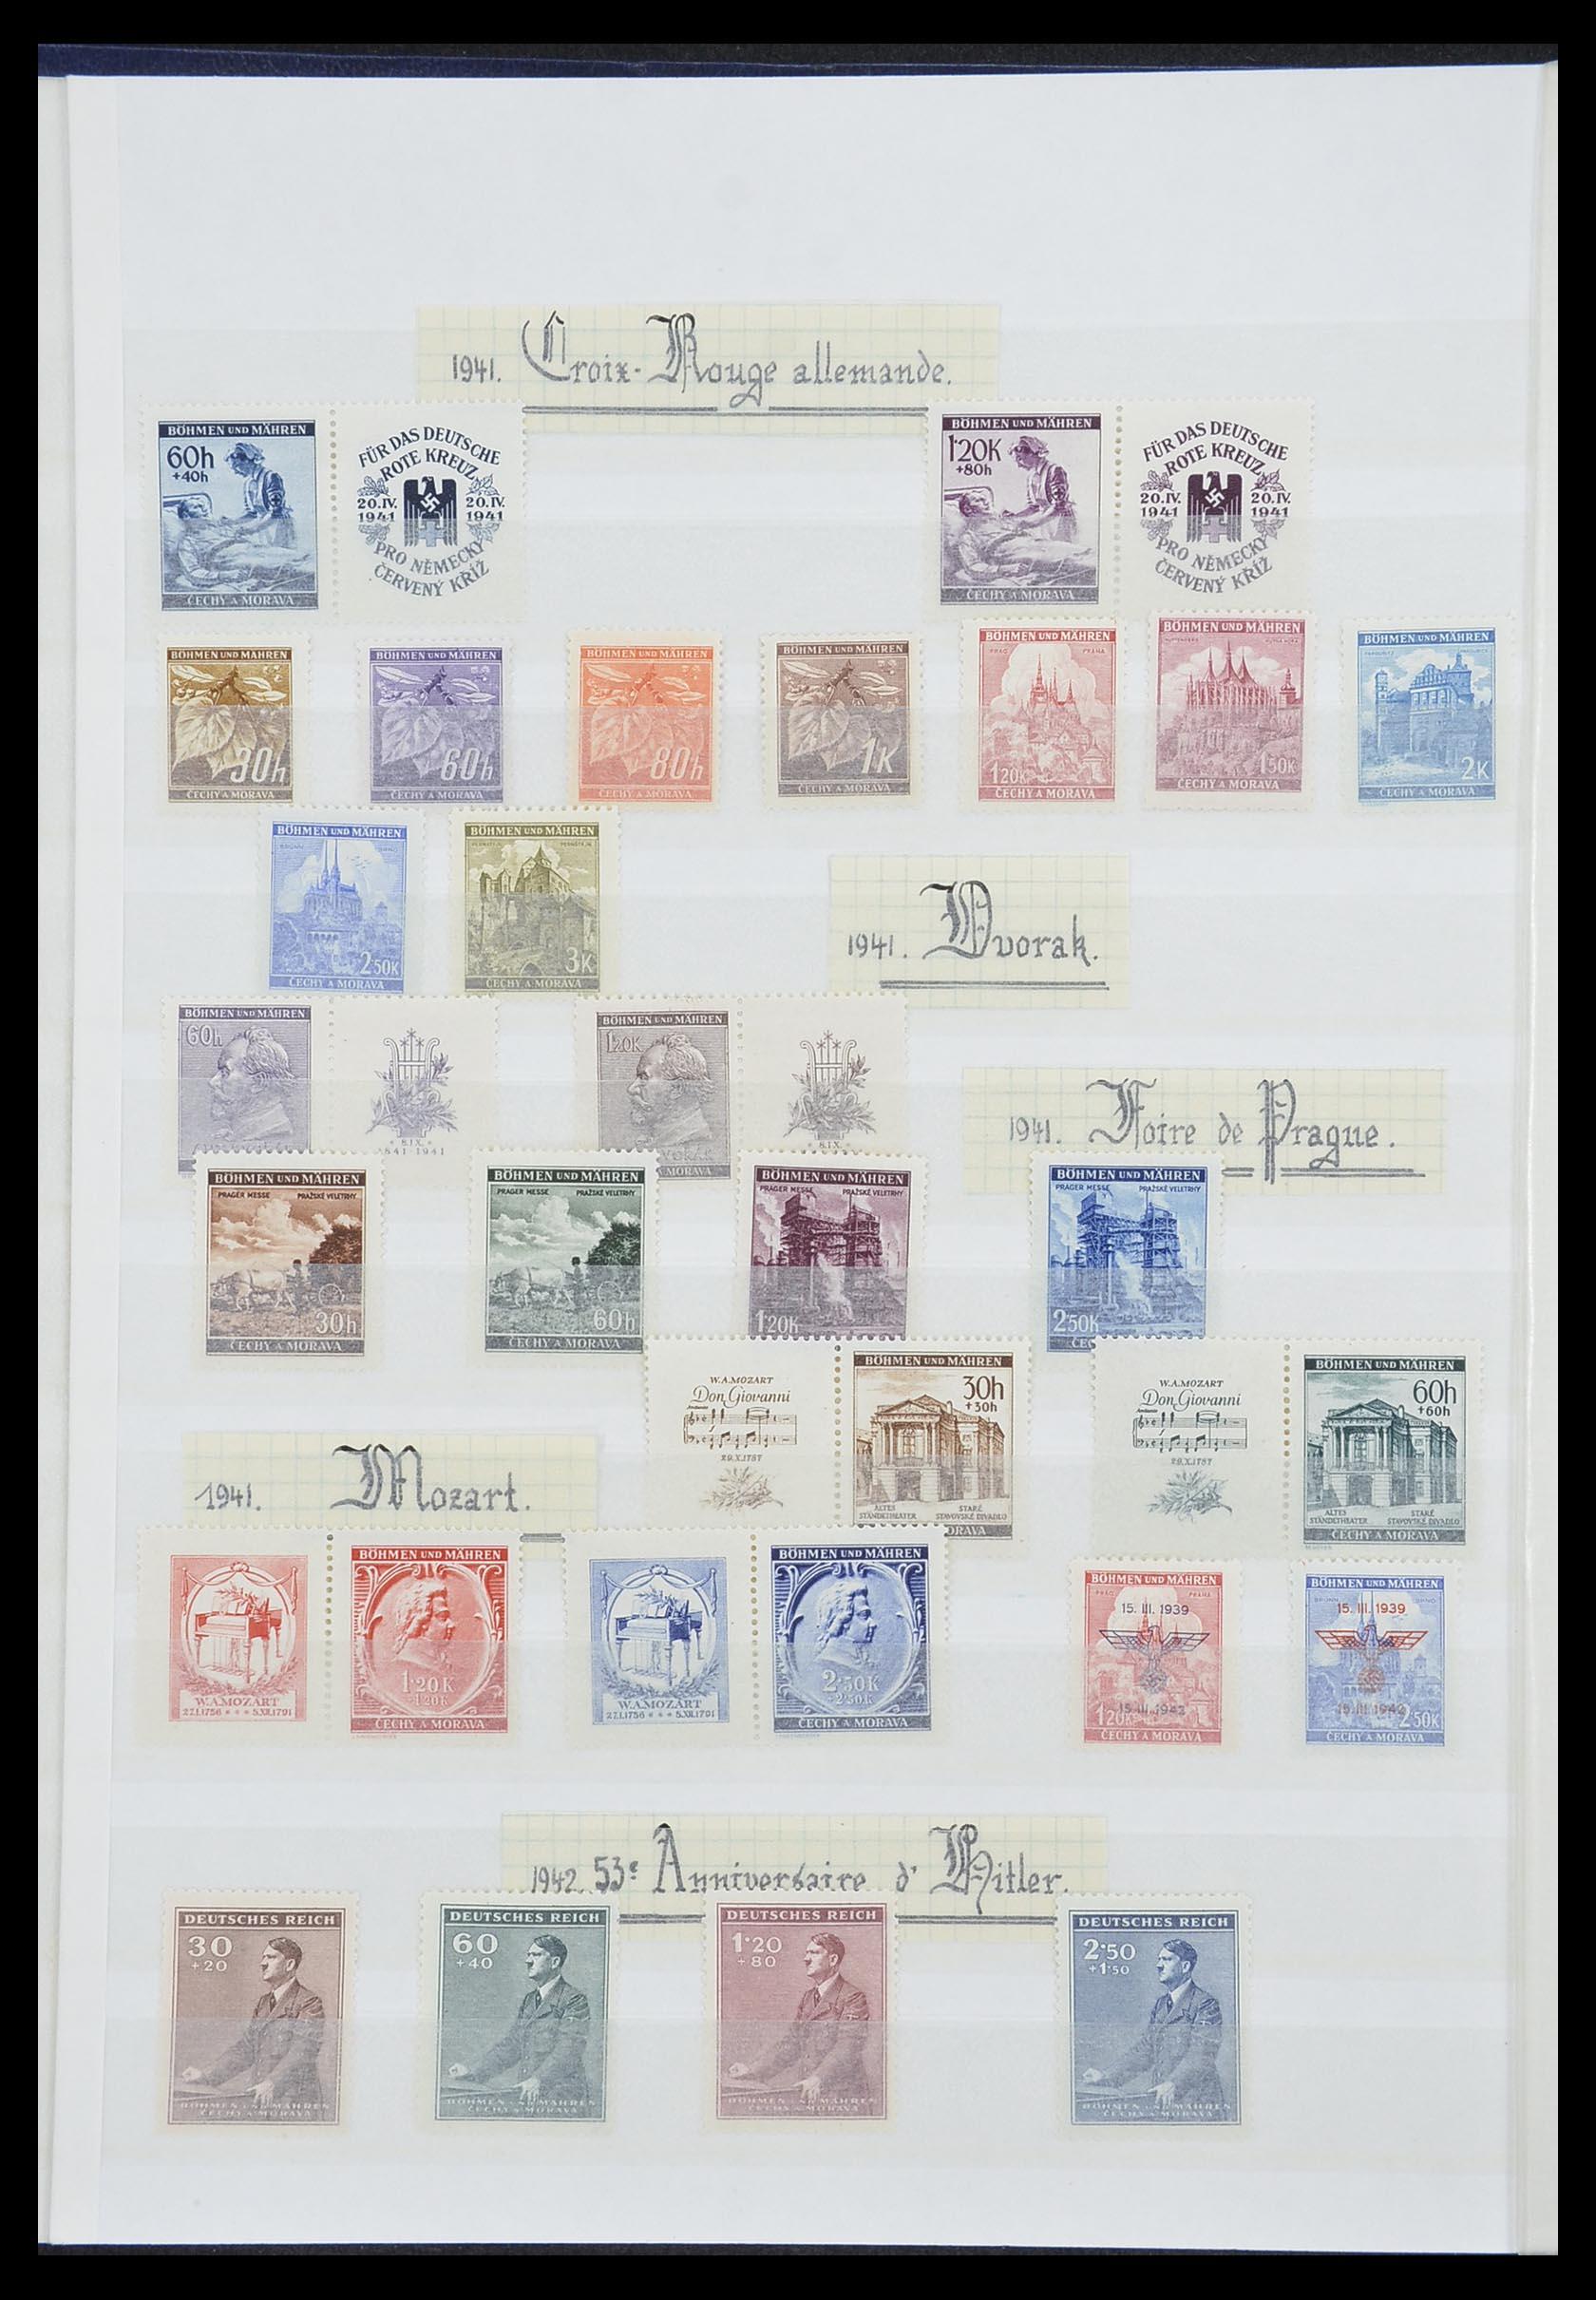 33850 010 - Postzegelverzameling 33850 Duitse bezettingen 2e wereldoorlog 1939-19